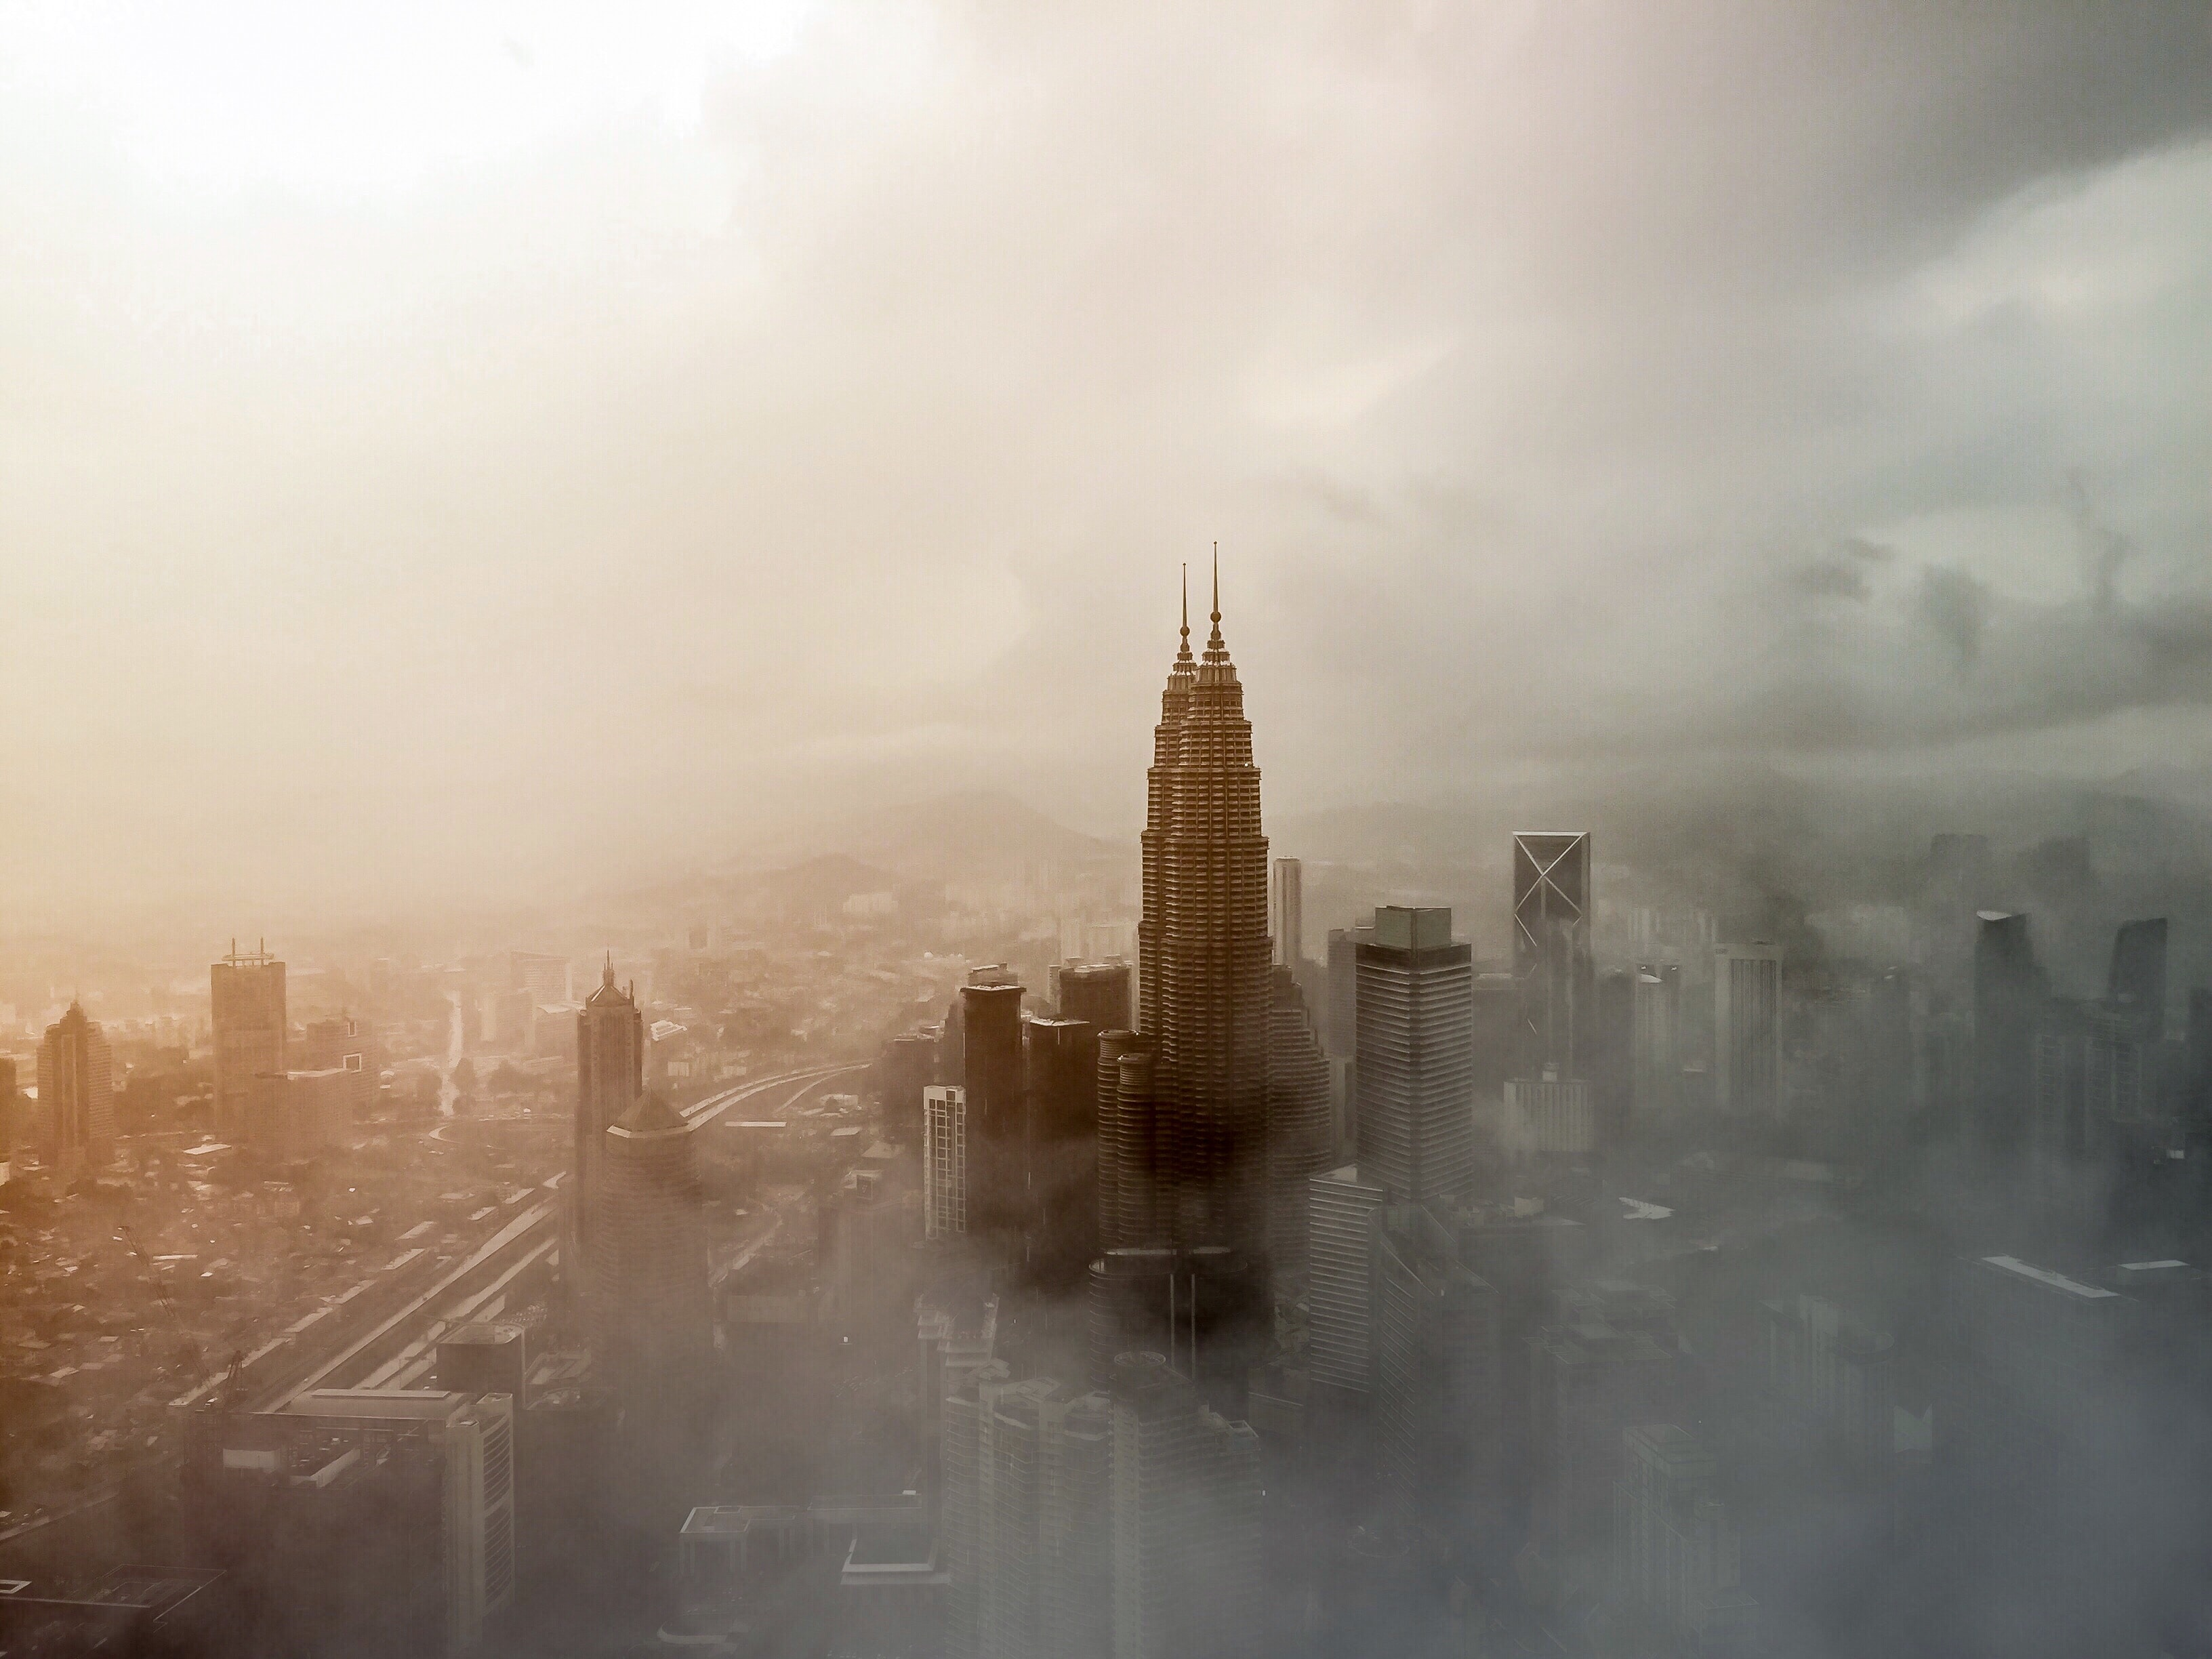 Tall skyscrapers in Kuala Lumpur wreathed in a dense fog